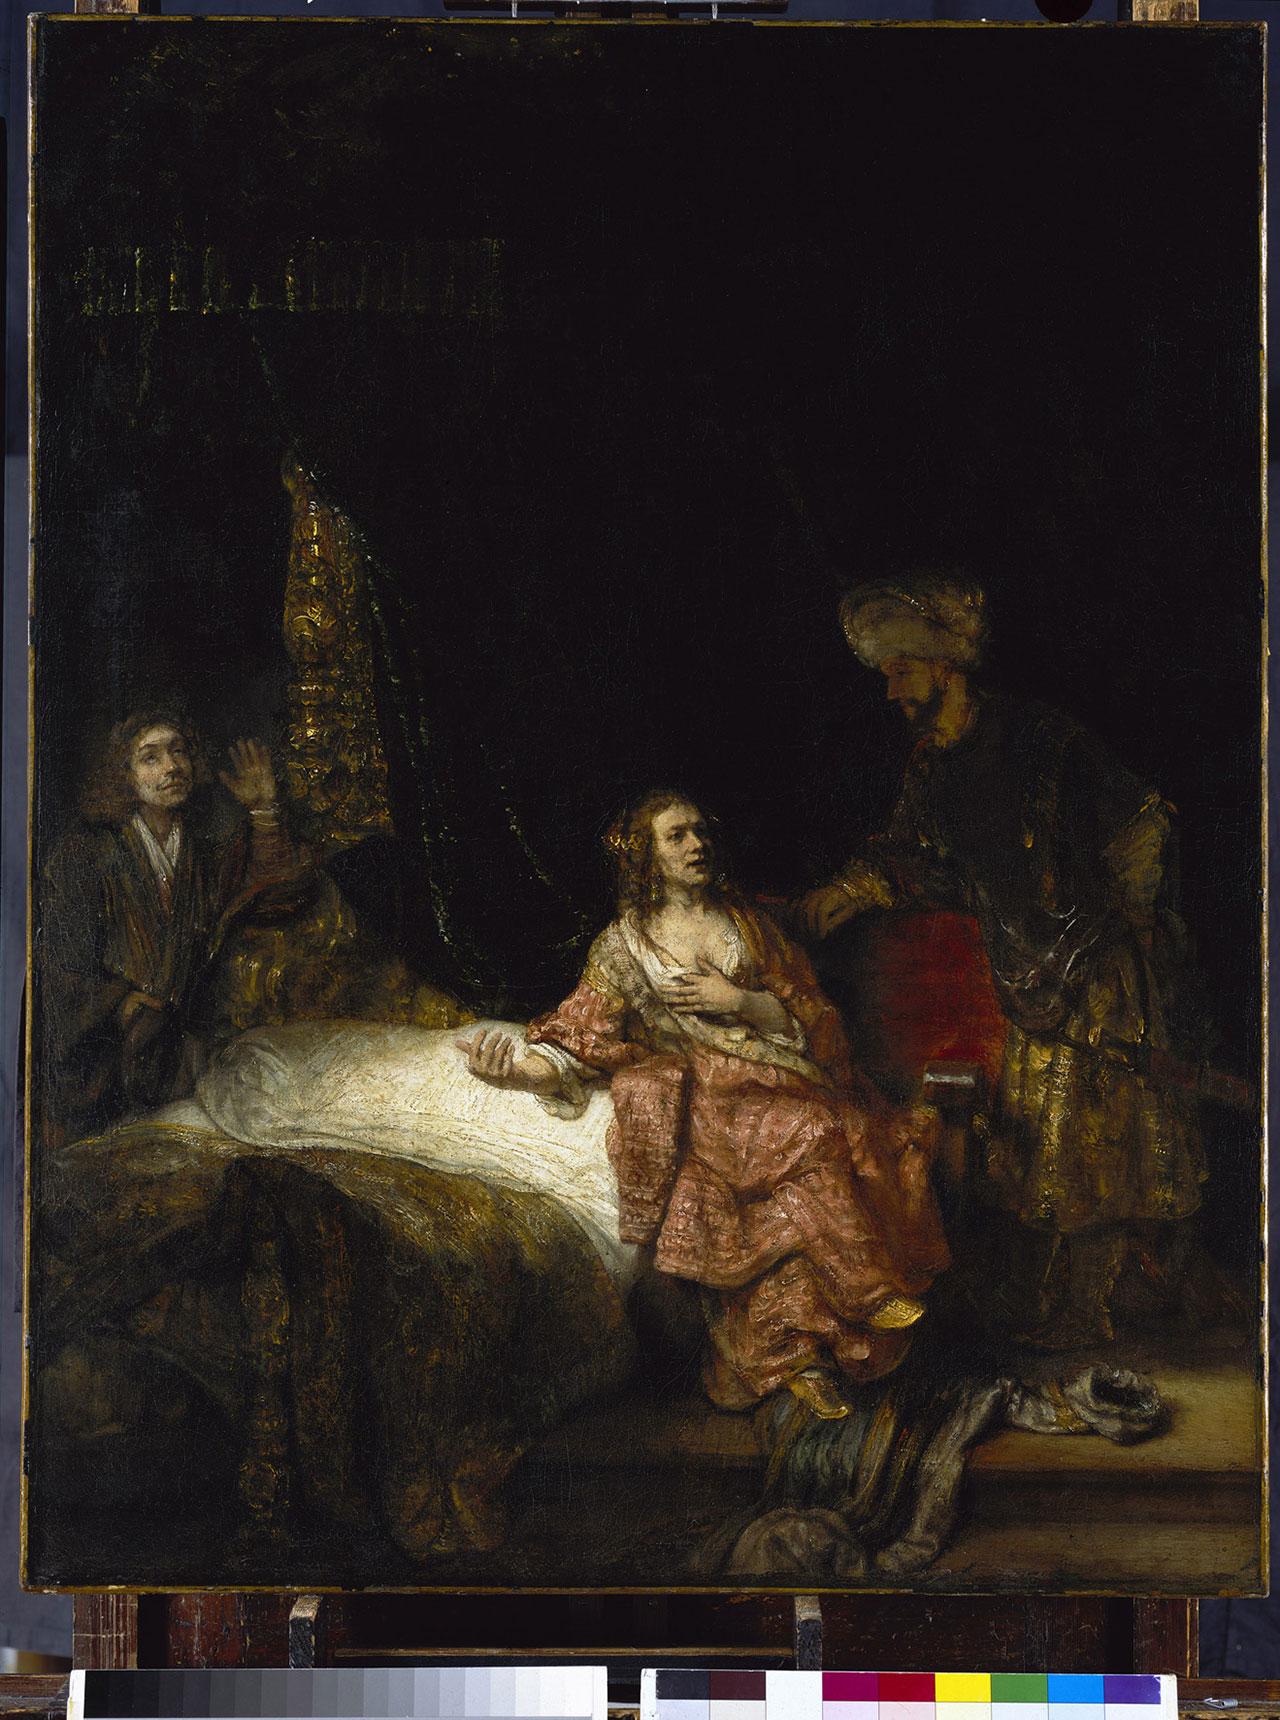 "Rembrandt, ""Joseph and Potiphar's Wife"" (1655), oil on canvas, 113.5 x 90 cm, Gemäldegalerie, Staatliche Museen zu Berlin-Preussischer Kulturbesitz (© Scala, Florence / Bildagentur für Kunst, Kultur und Geschichte, Berlin. Photo: Jörg Anders)"